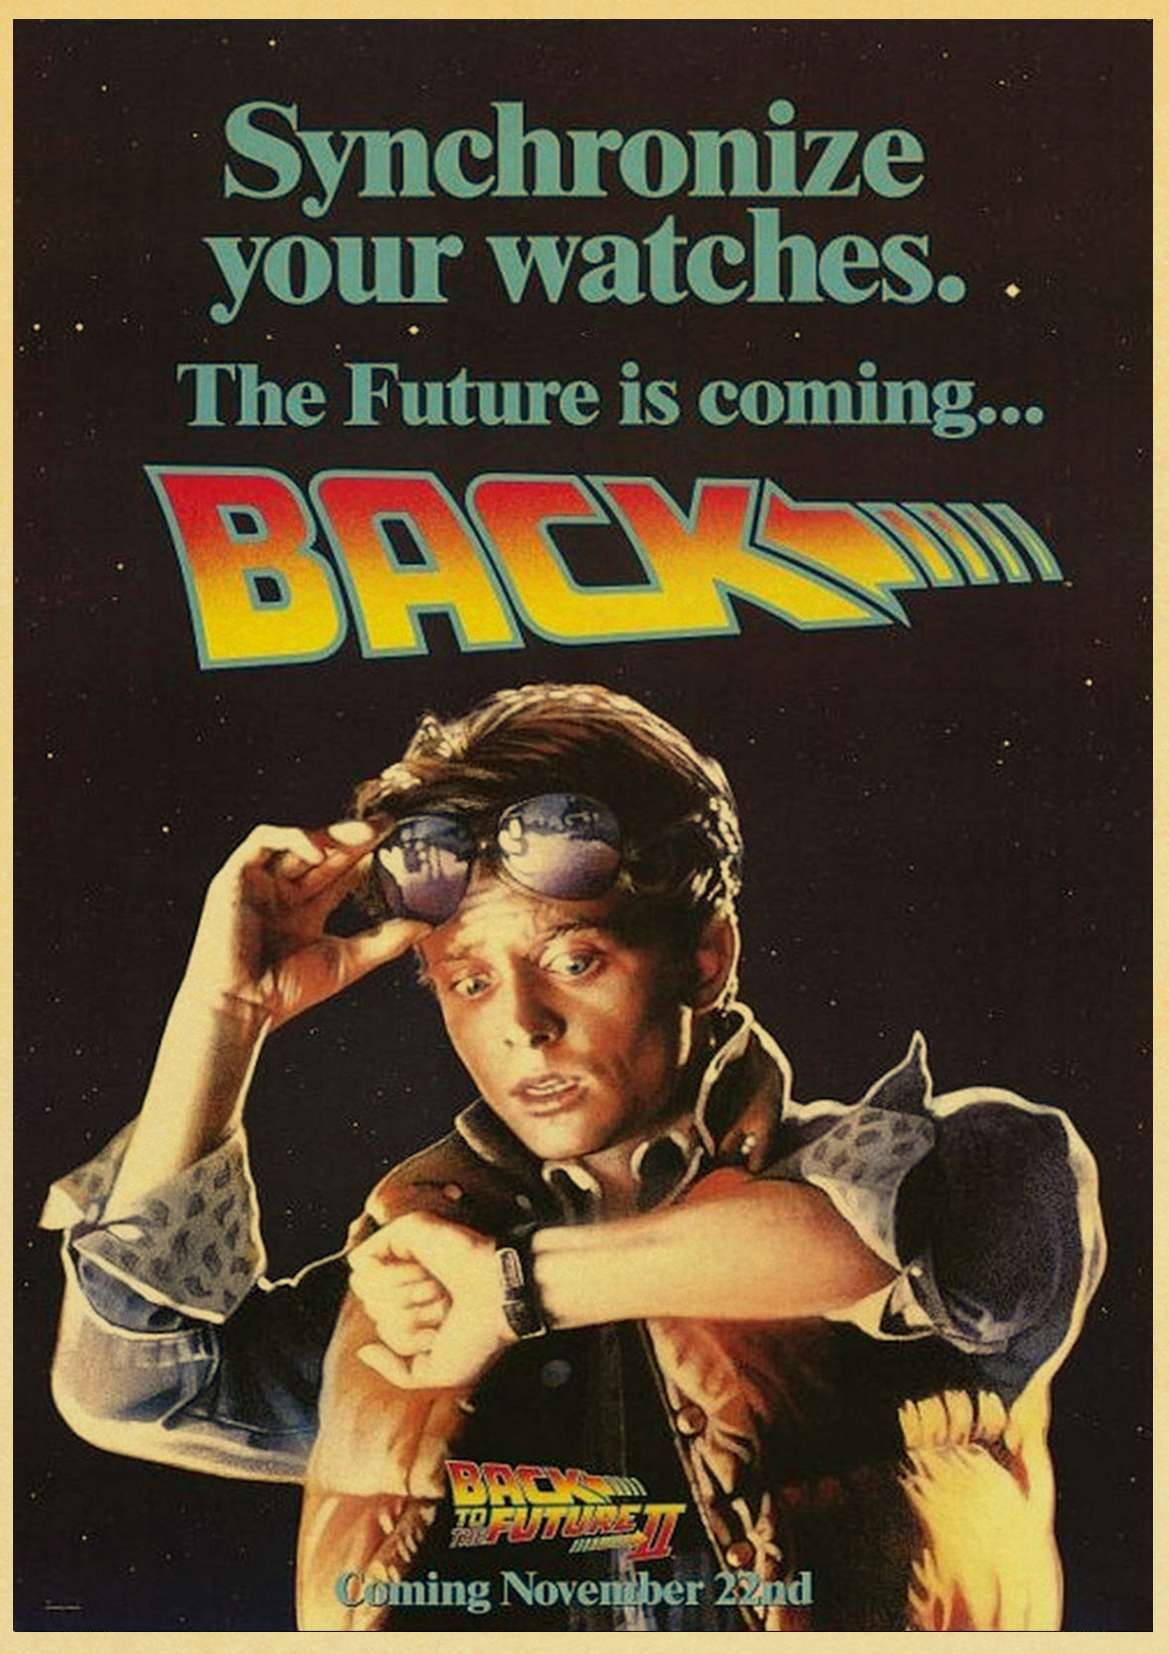 HTB1WZnJlaSWBuNjSsrbq6y0mVXah Sci-fi Back to The Future Film Propaganda Retro Kraft Poster Decorative DIY Wall Canvas Sticker Home Bar Art Posters Decor